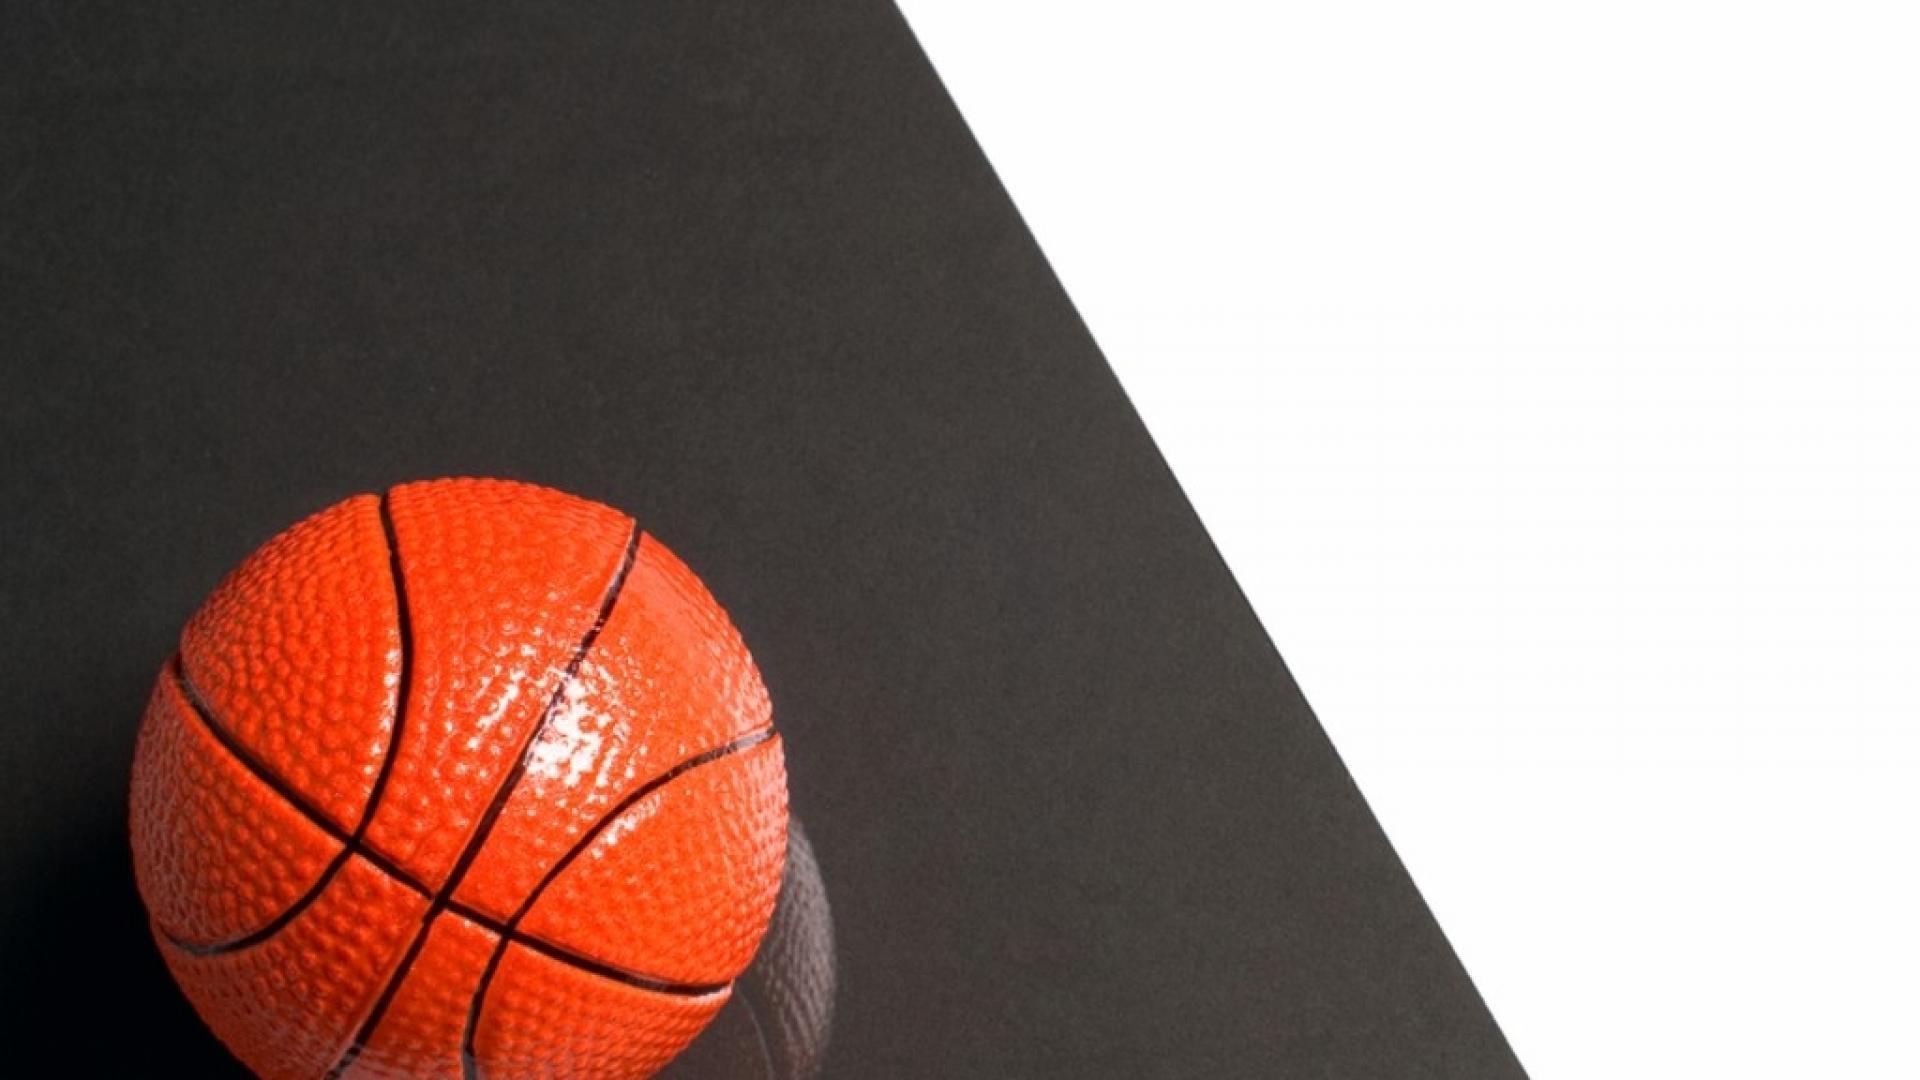 wallpaper ball boy basketball - photo #5